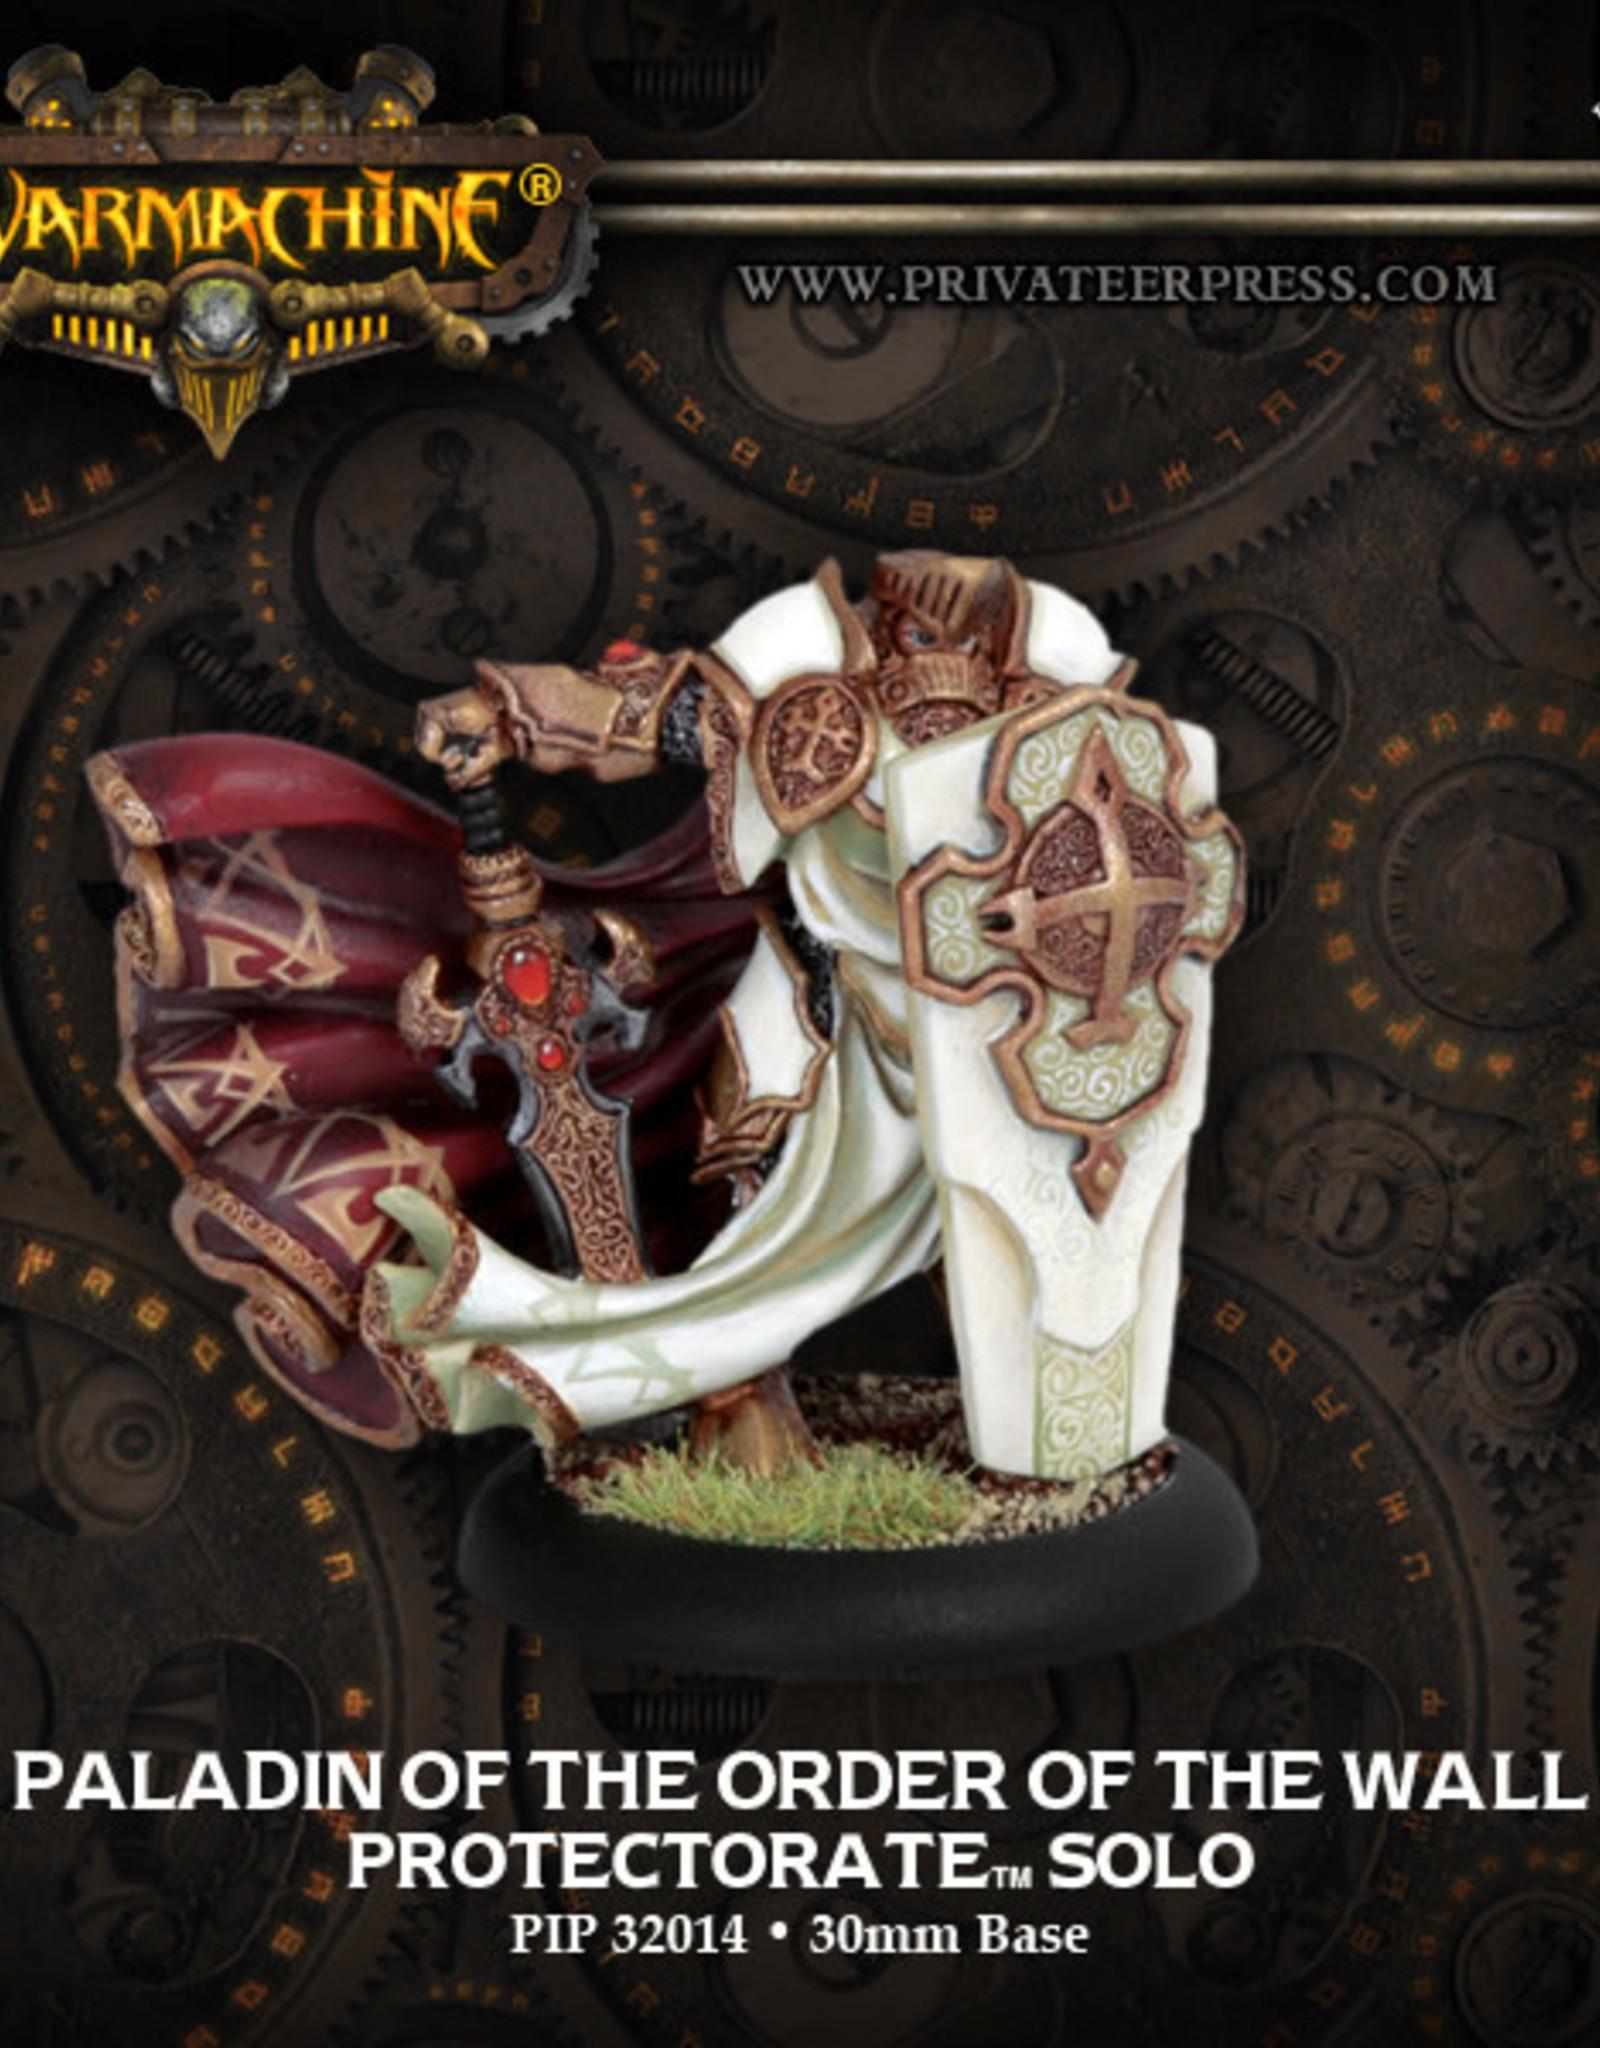 Warmachine Protectorate - Paladin